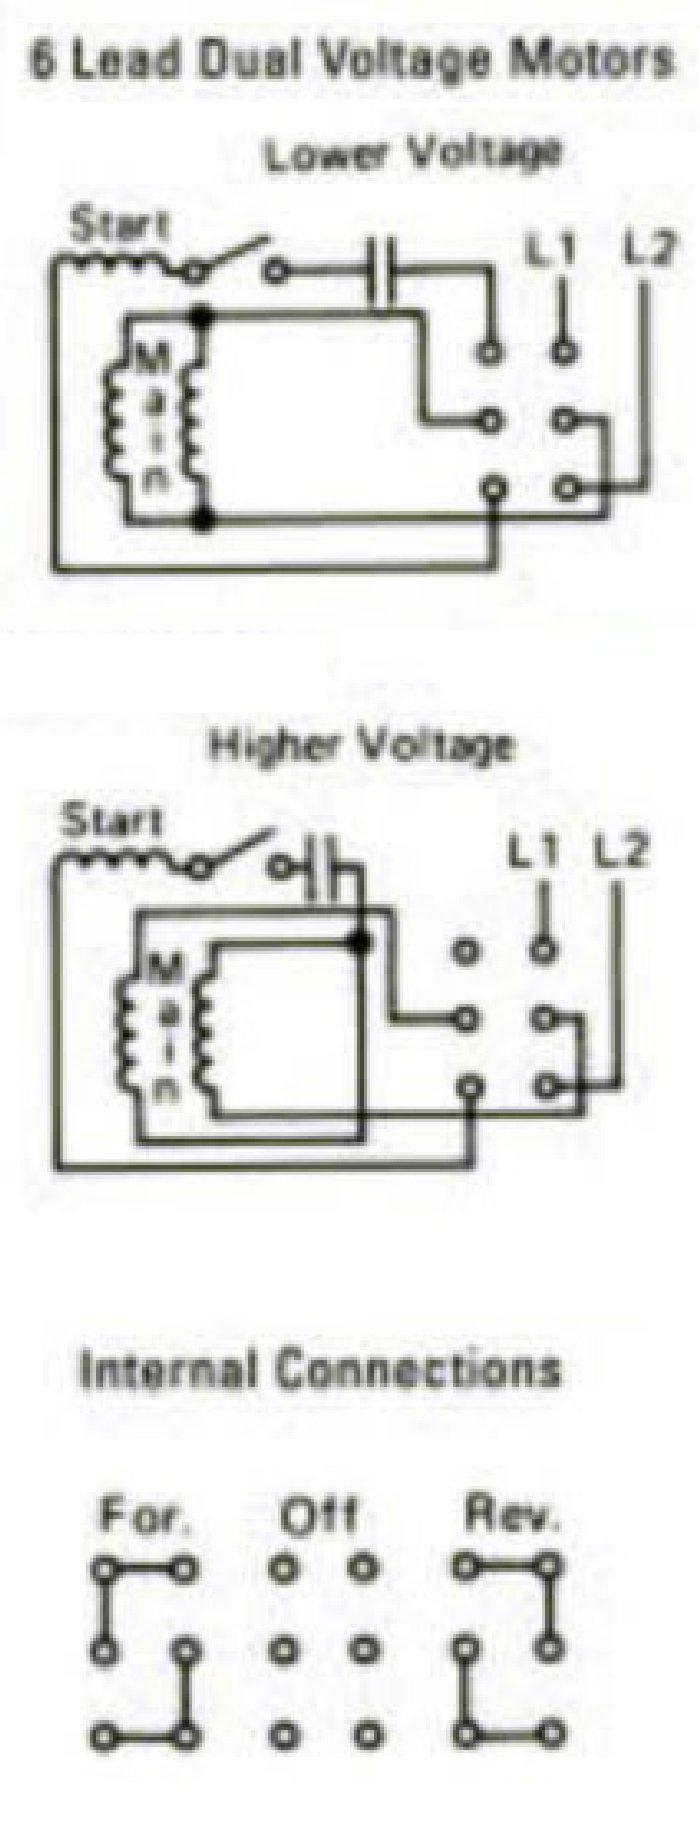 Wondrous Bremas Boat Lift Switch Wiring Diagram Wiring Diagram General Wiring Cloud Hemtegremohammedshrineorg